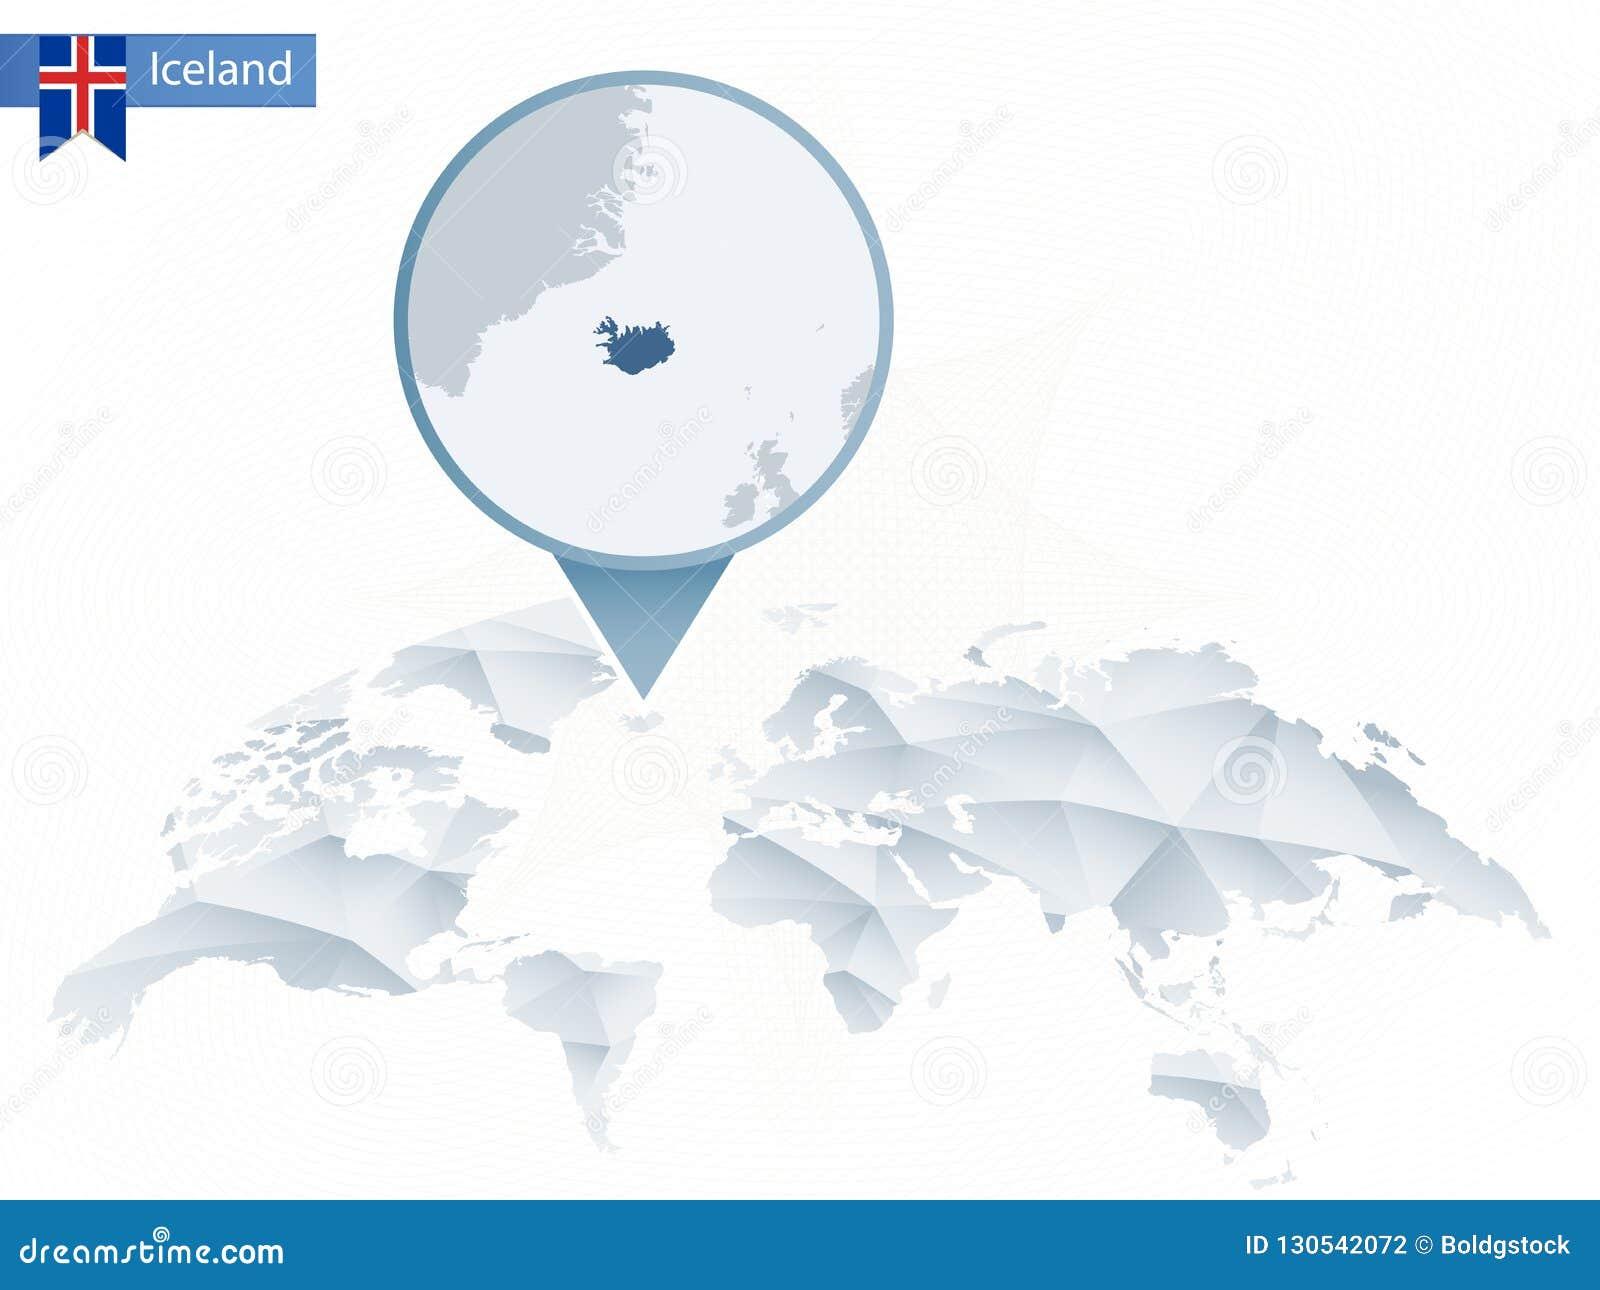 Abstract Rounded World Map With Pinned Detailed Iceland Map. Stock on kazakhstan world map, british isles world map, cape verde world map, faroe islands, lesotho world map, germany world map, new zealand, indonesia world map, antartica world map, guam world map, sri lanka world map, india world map, haiti world map, scotland world map, japan world map, ireland world map, ceylon world map, norway world map, western samoa world map, south korea world map, united kingdom, austria world map, panama world map,